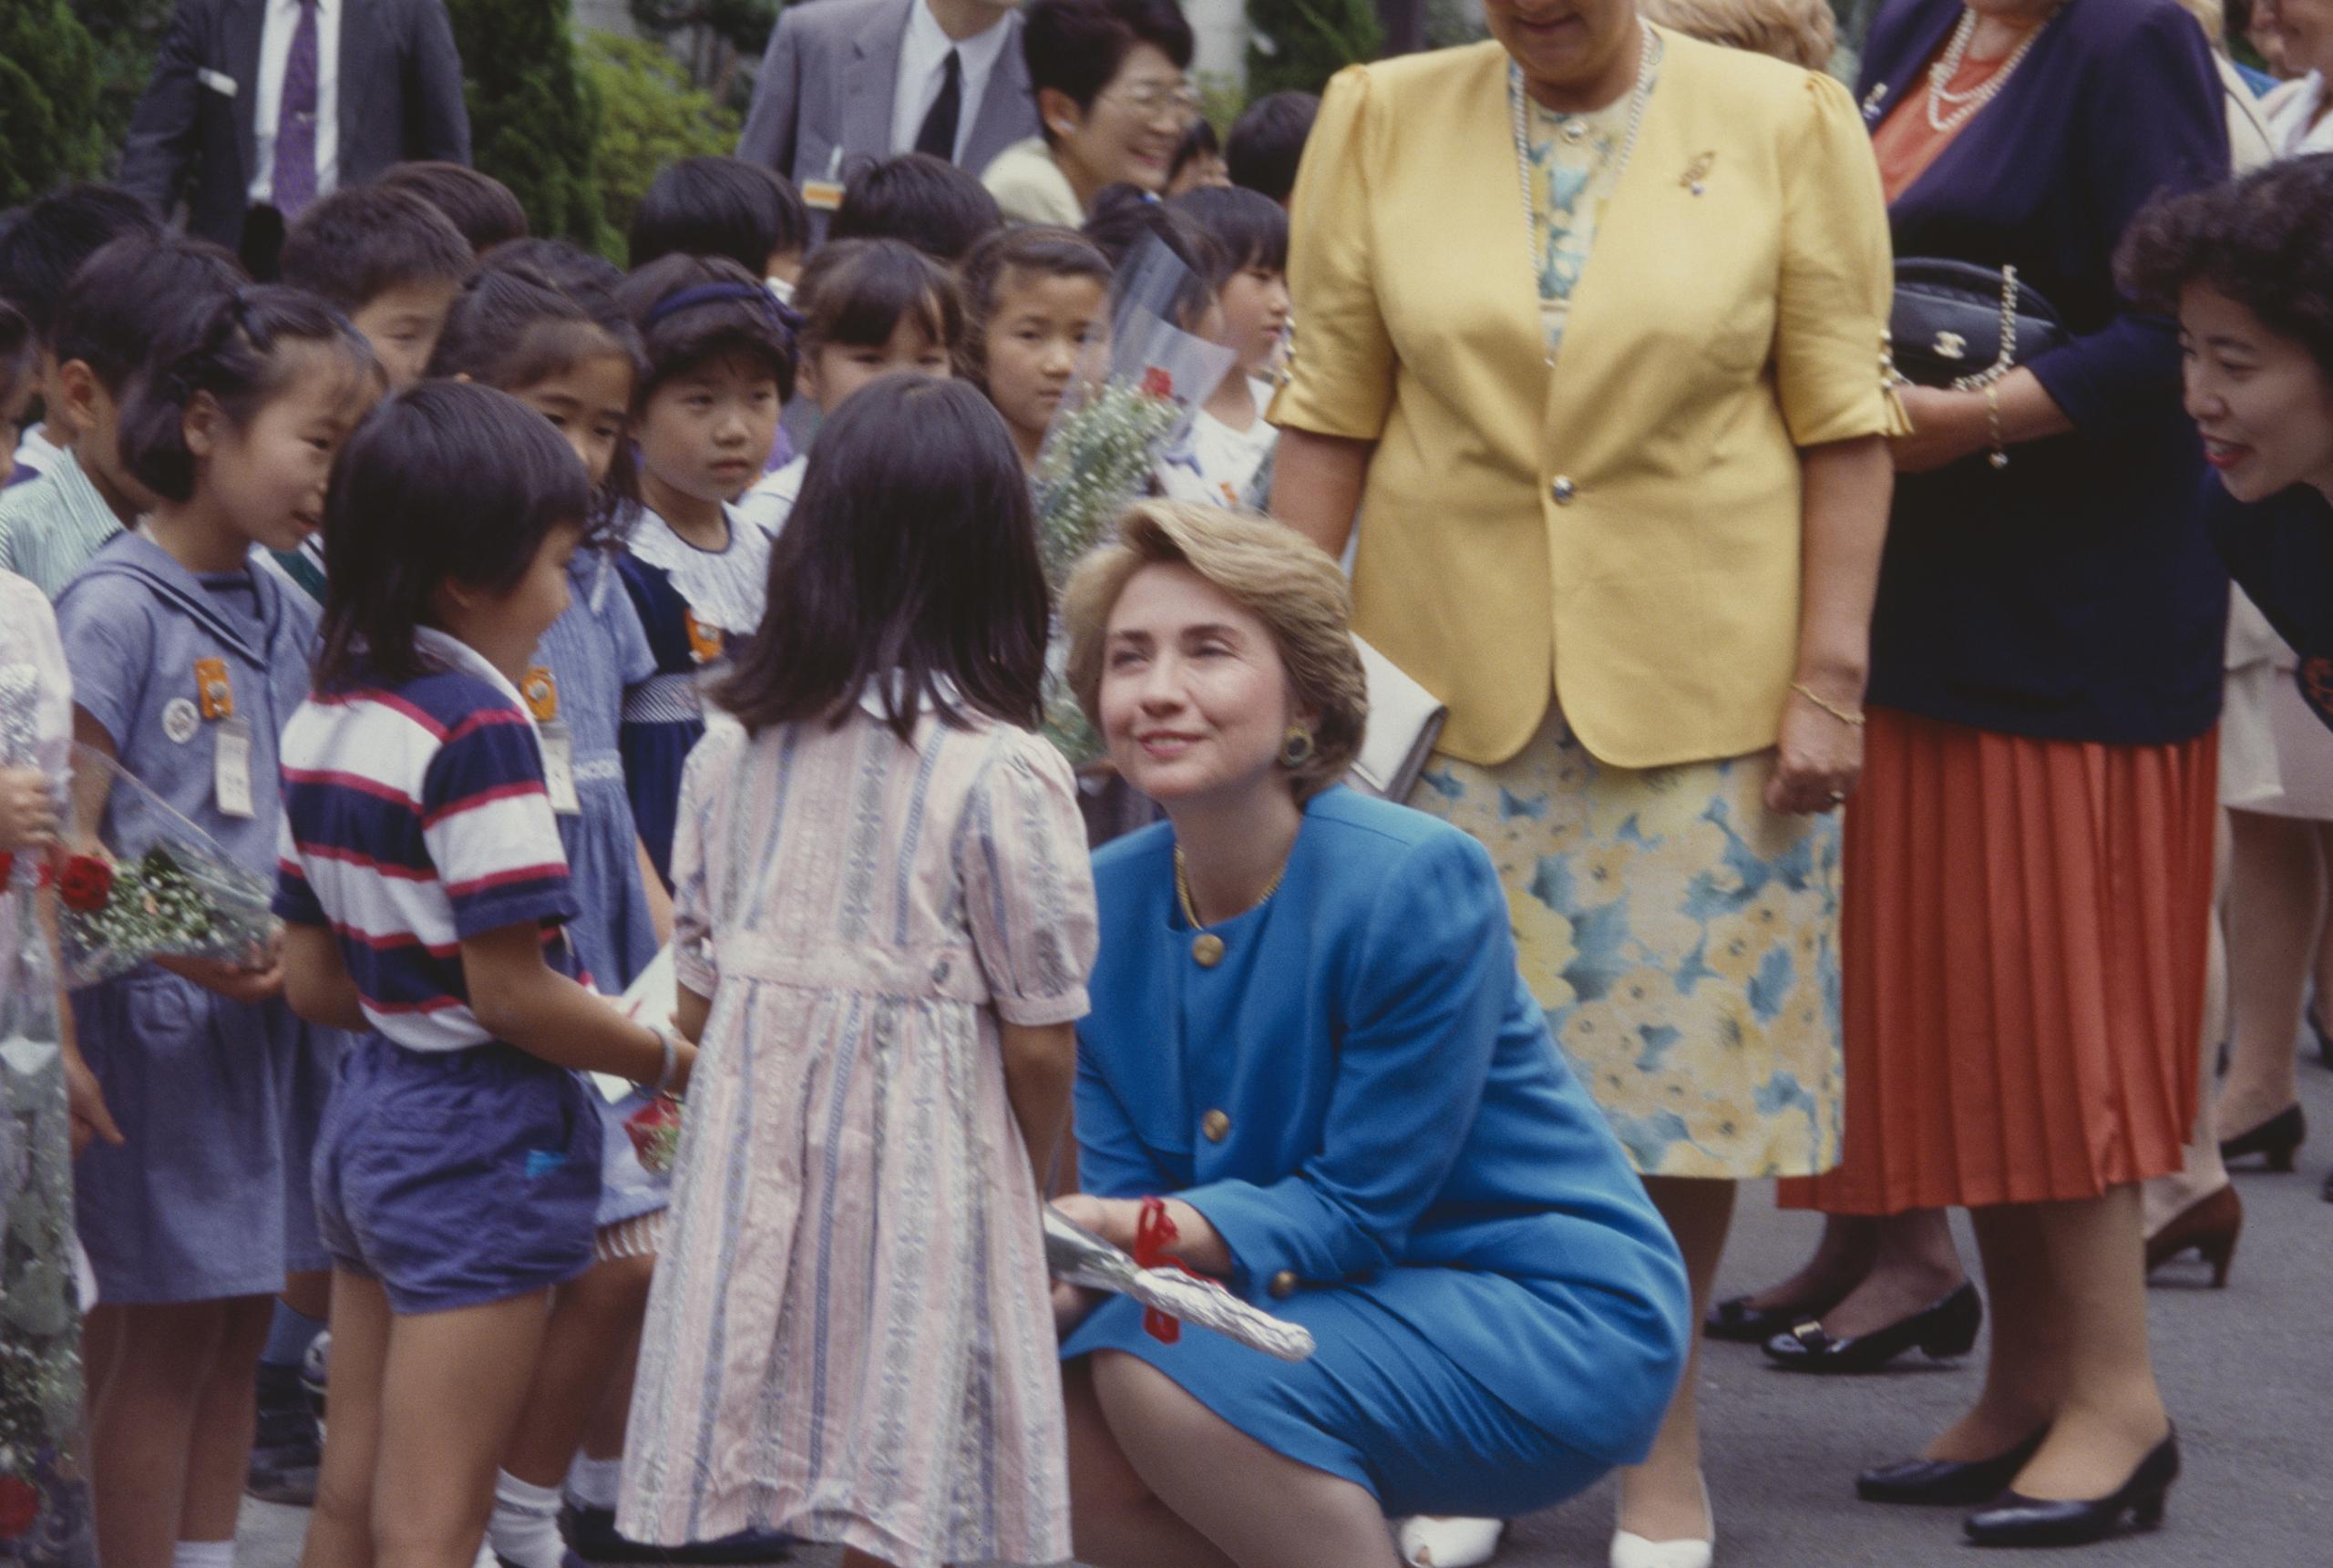 Hillary Clinton talking to children in a crowd, circa 1994.